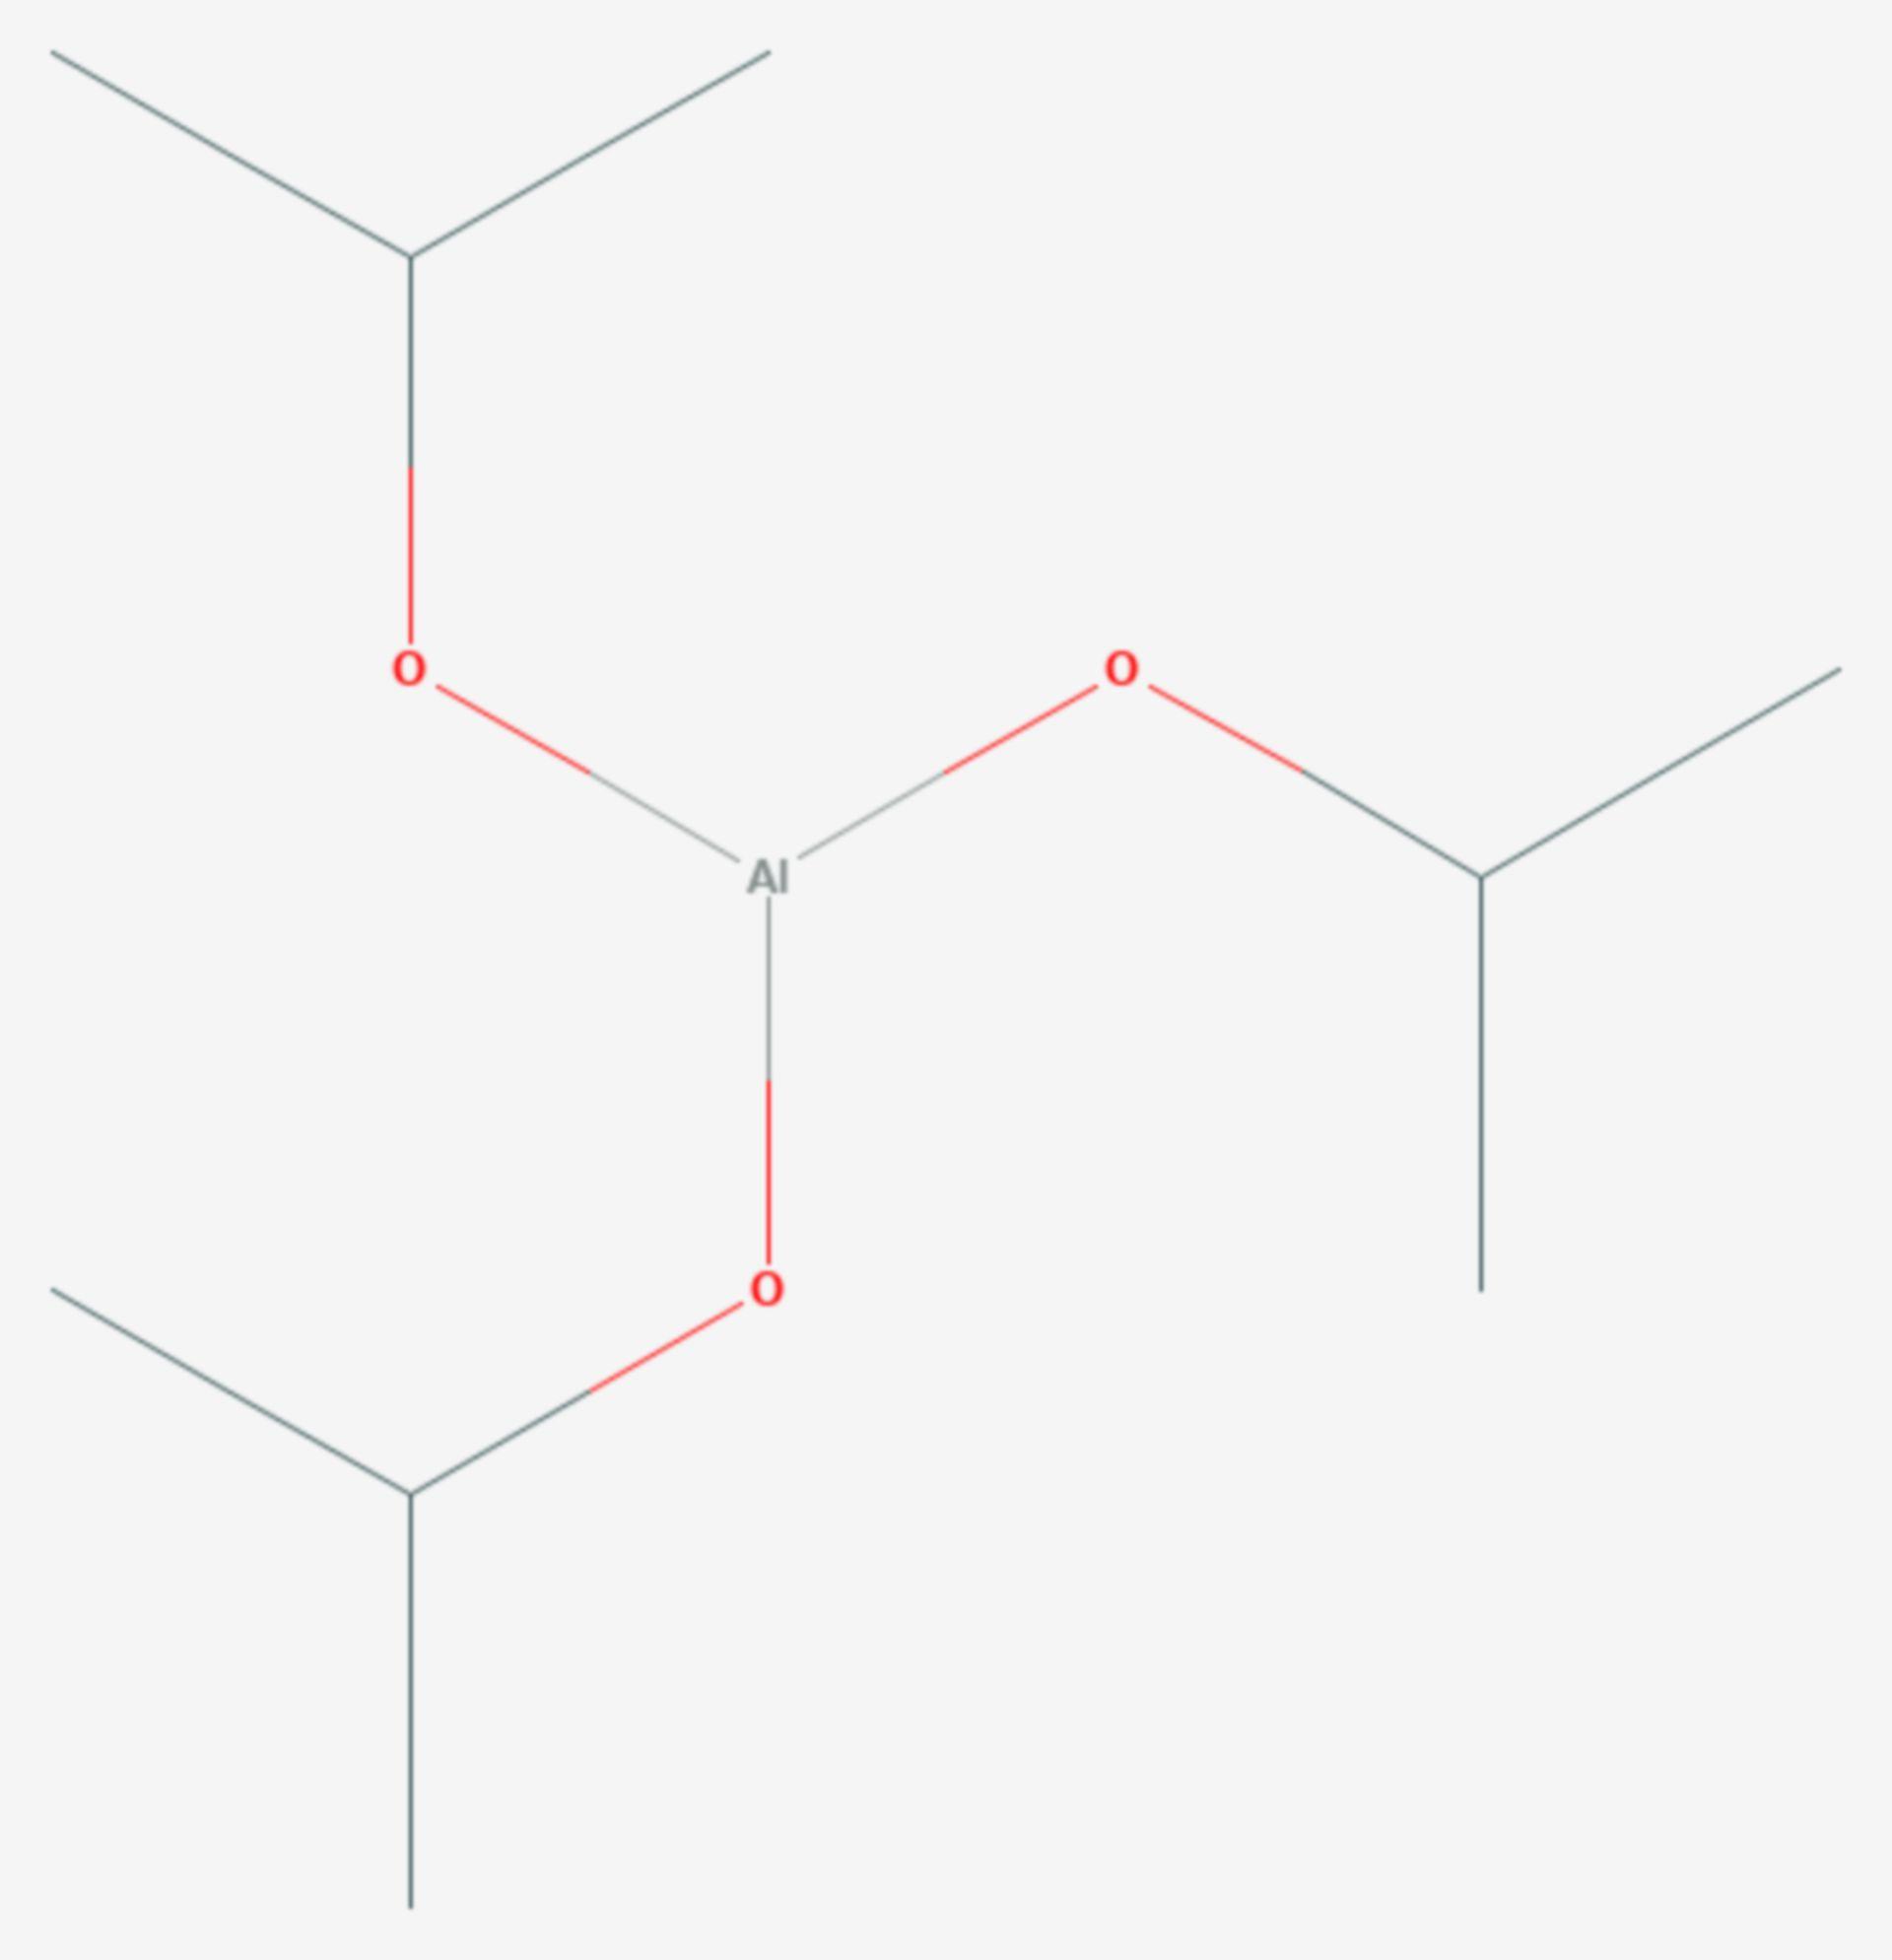 Aluminiumtriisopropanolat (Strukturformel)